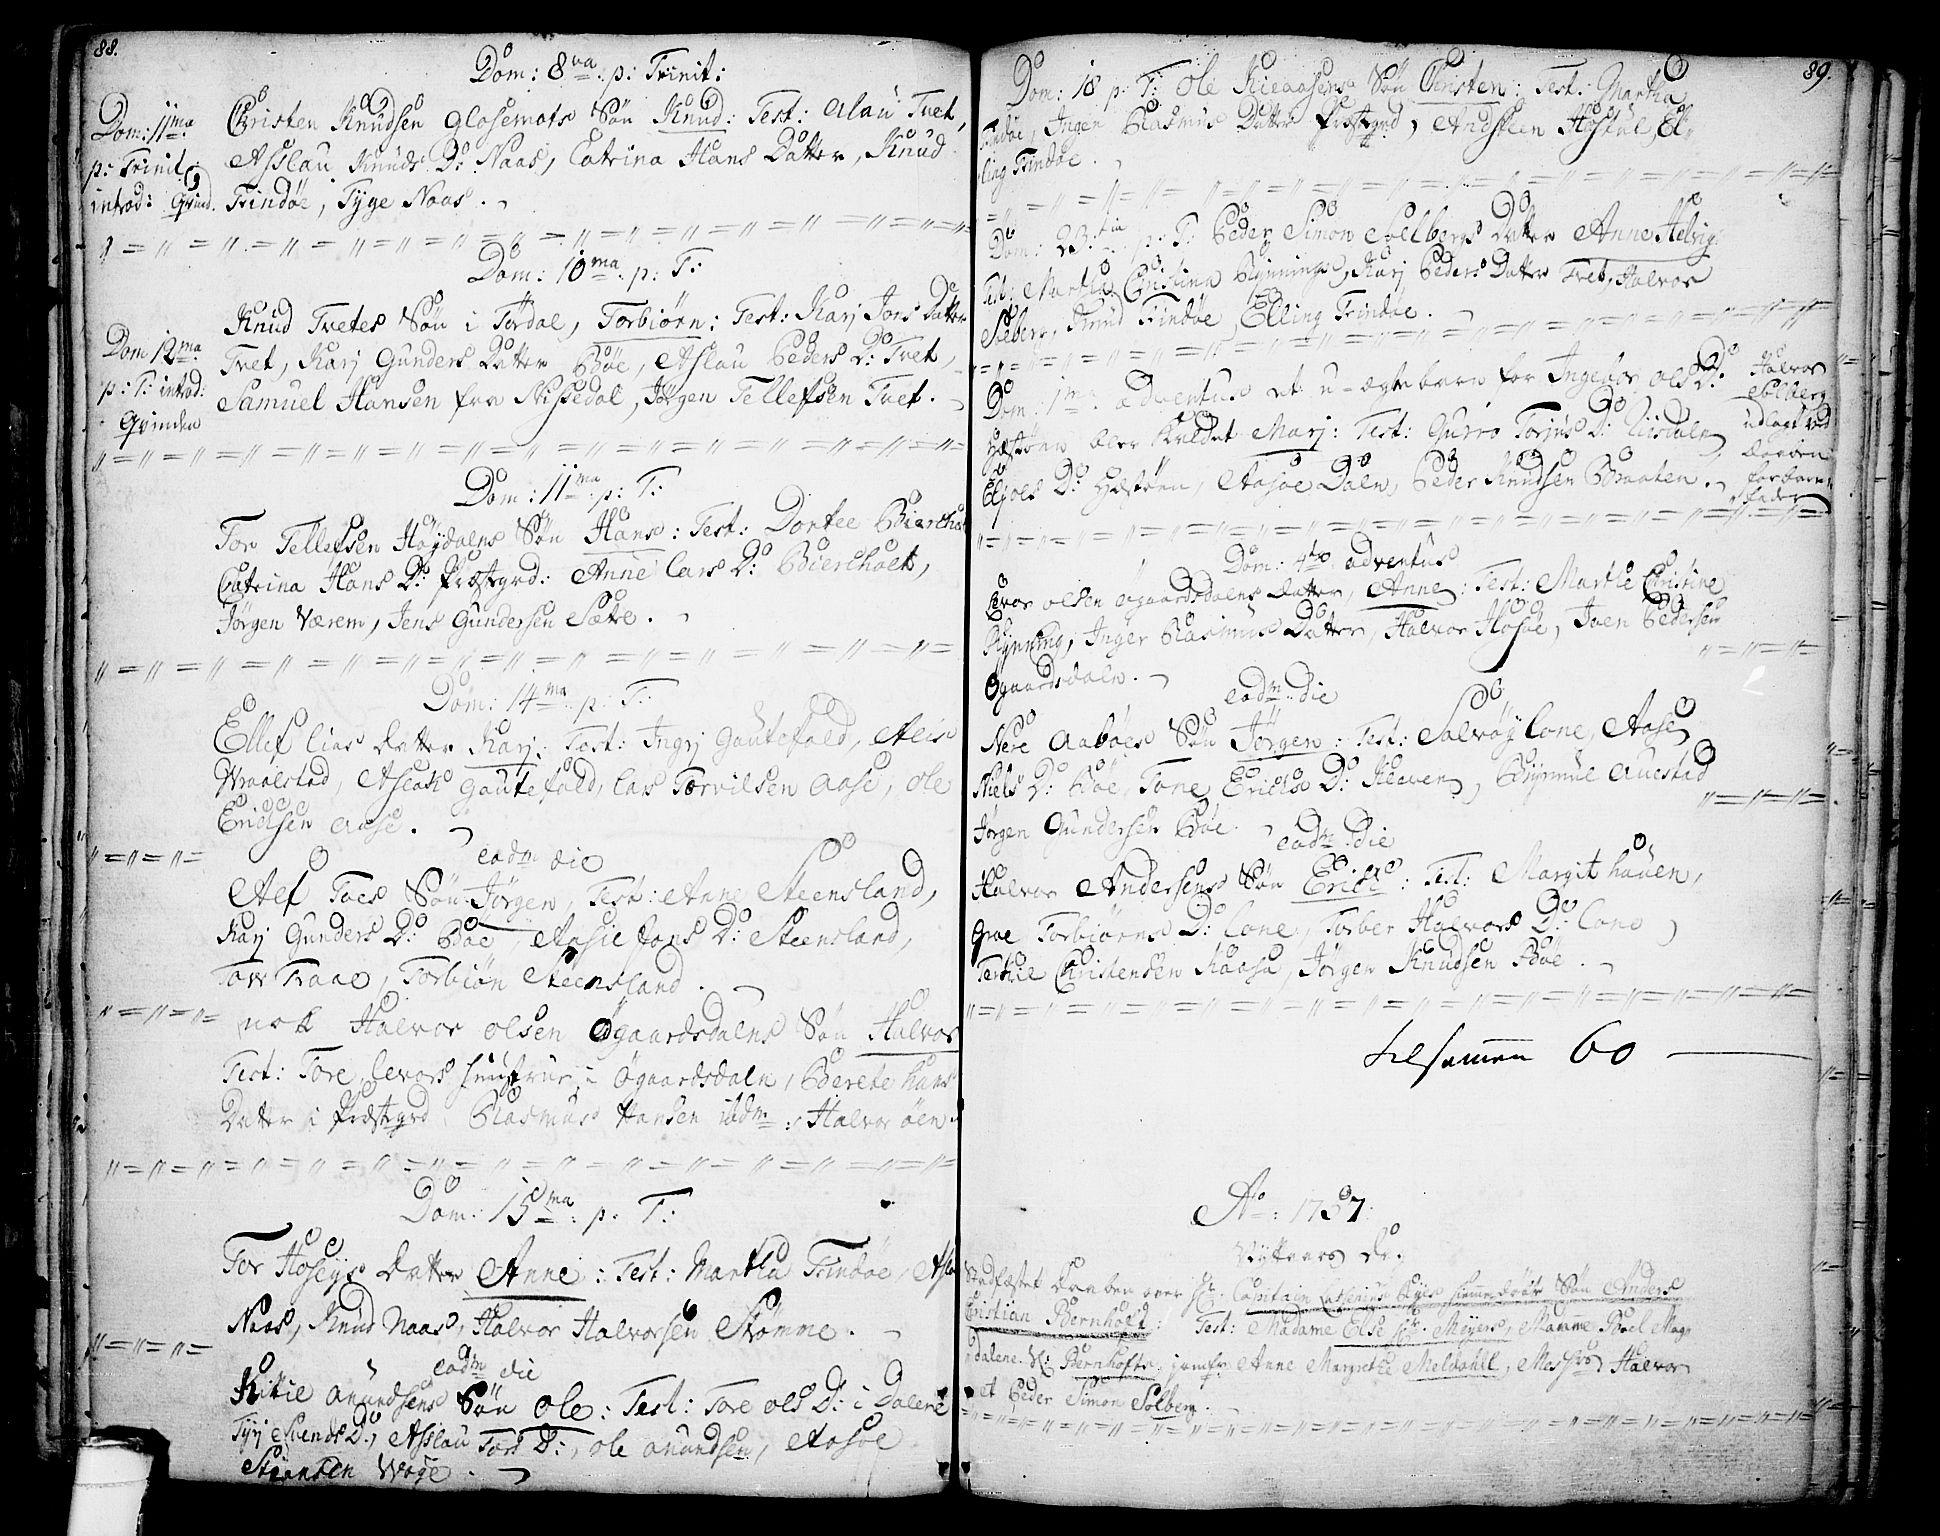 SAKO, Drangedal kirkebøker, F/Fa/L0001: Ministerialbok nr. 1, 1697-1767, s. 88-89